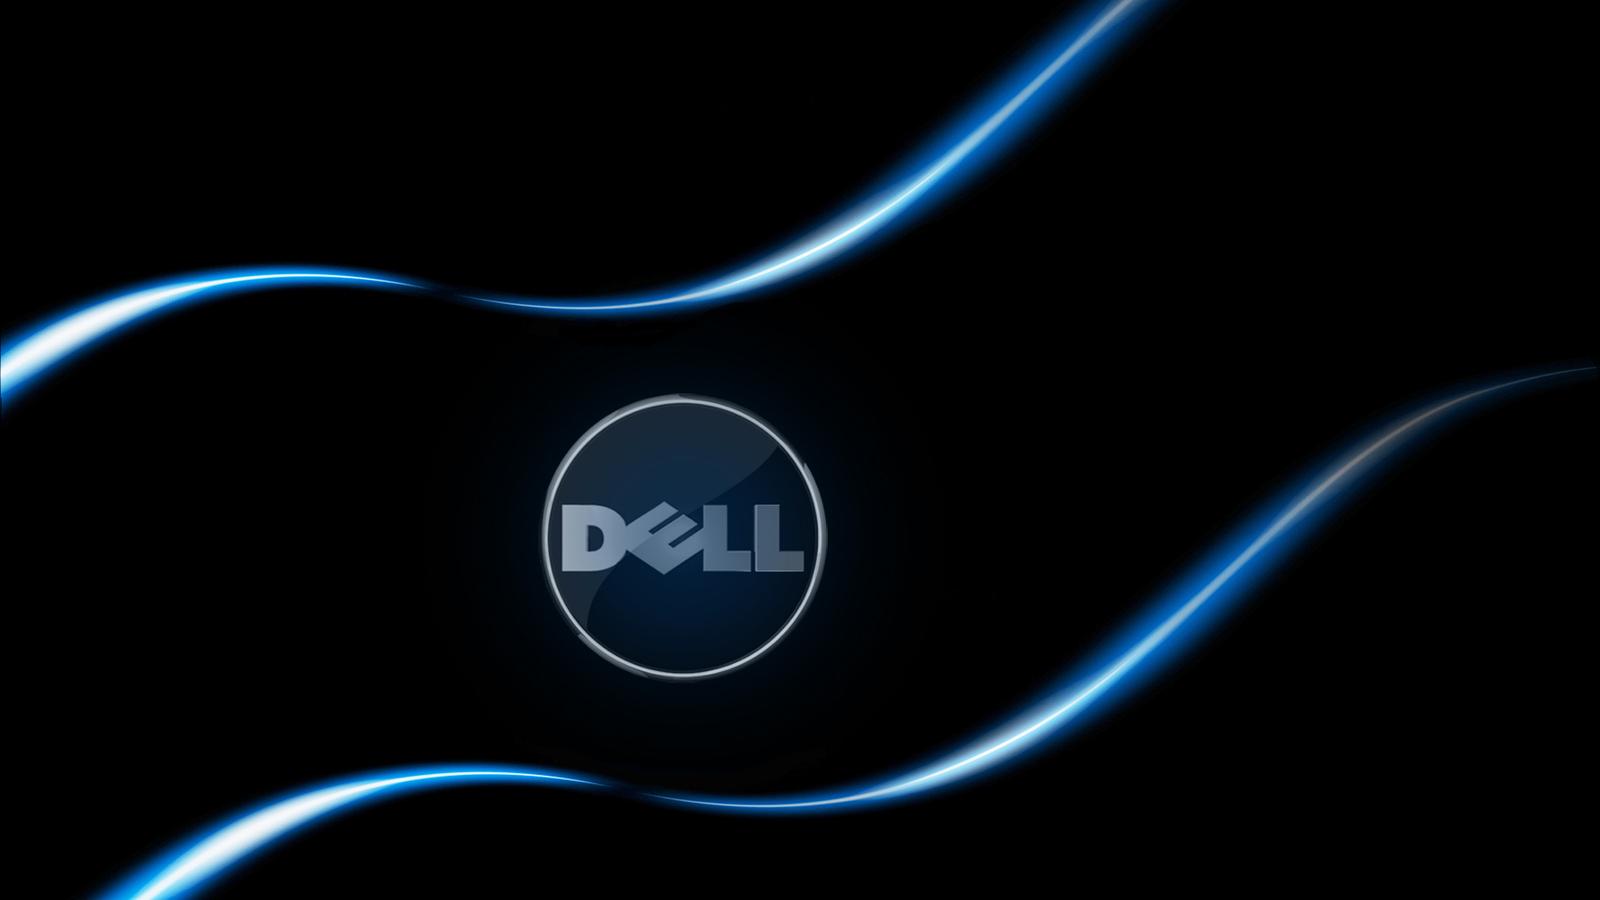 Dell Desktop Backgrounds Wallpaper 1600x900 1600x900